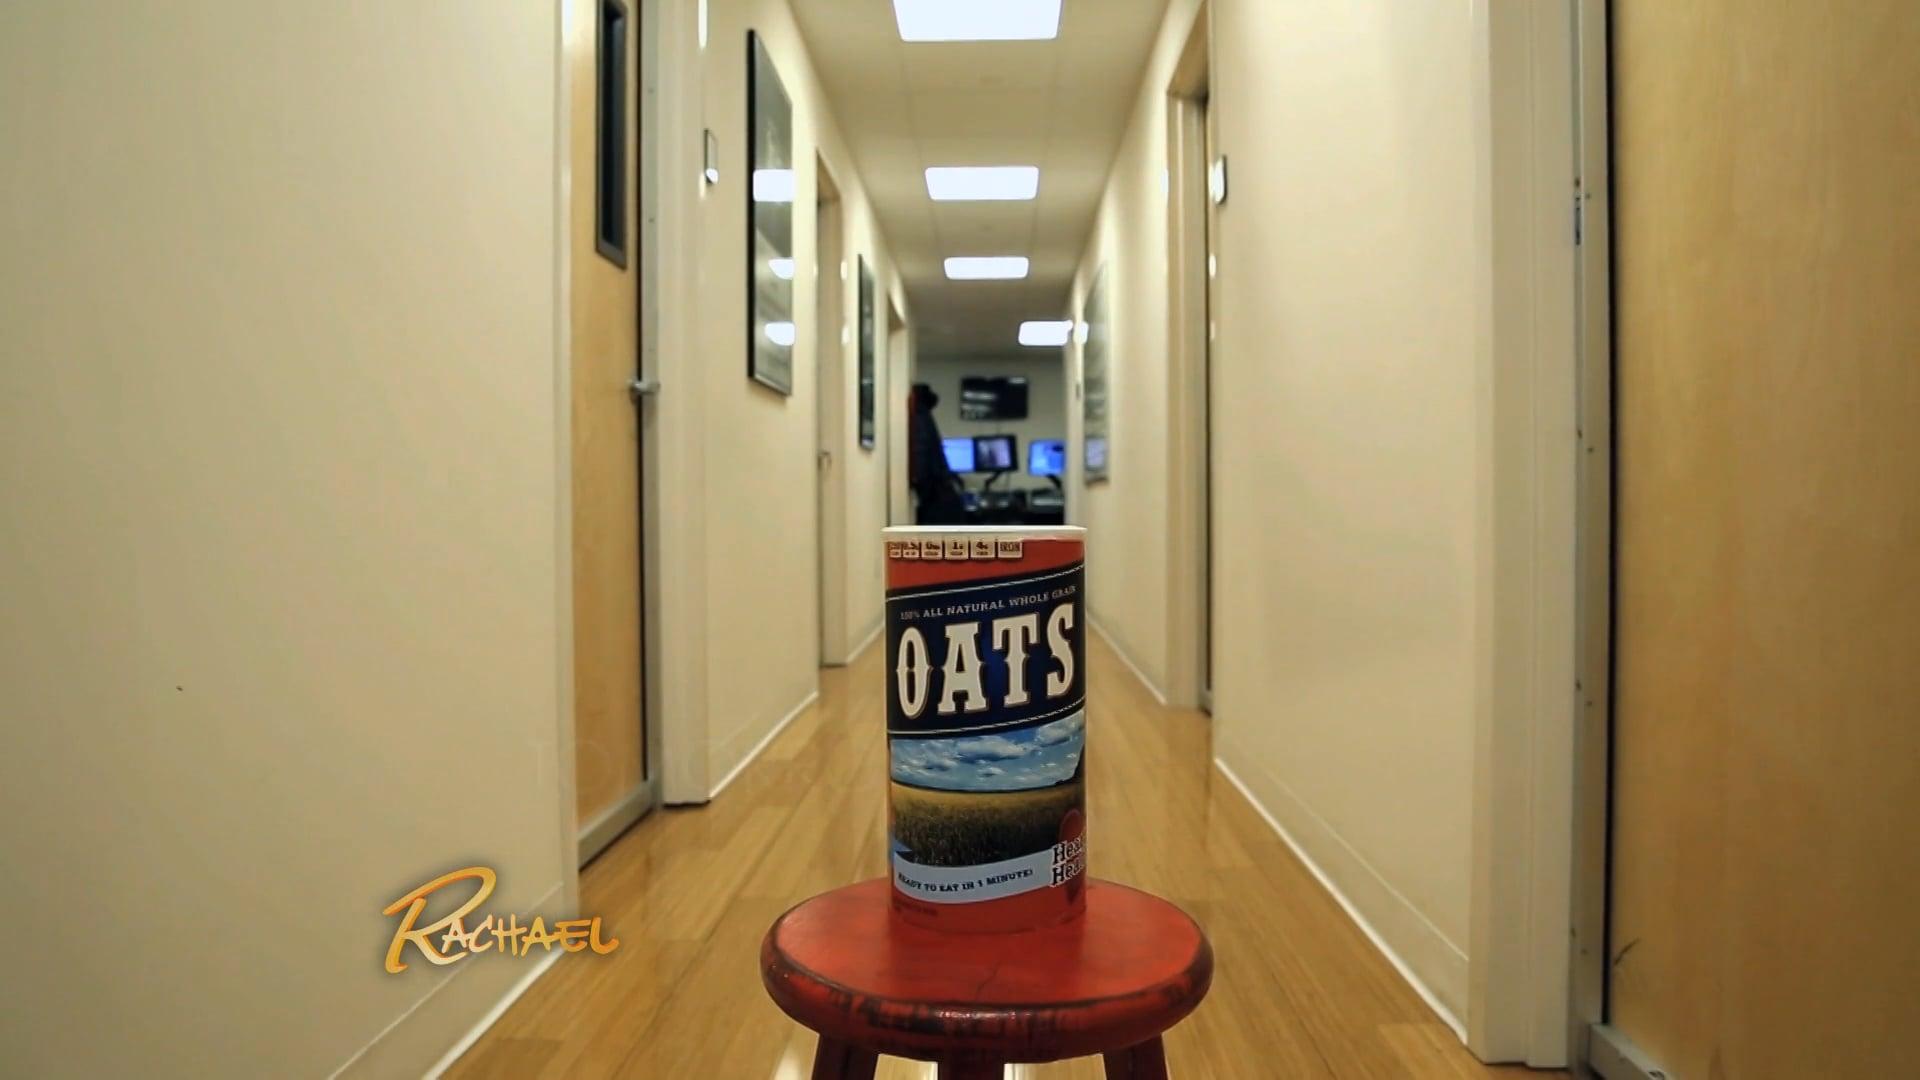 Hall and Oats